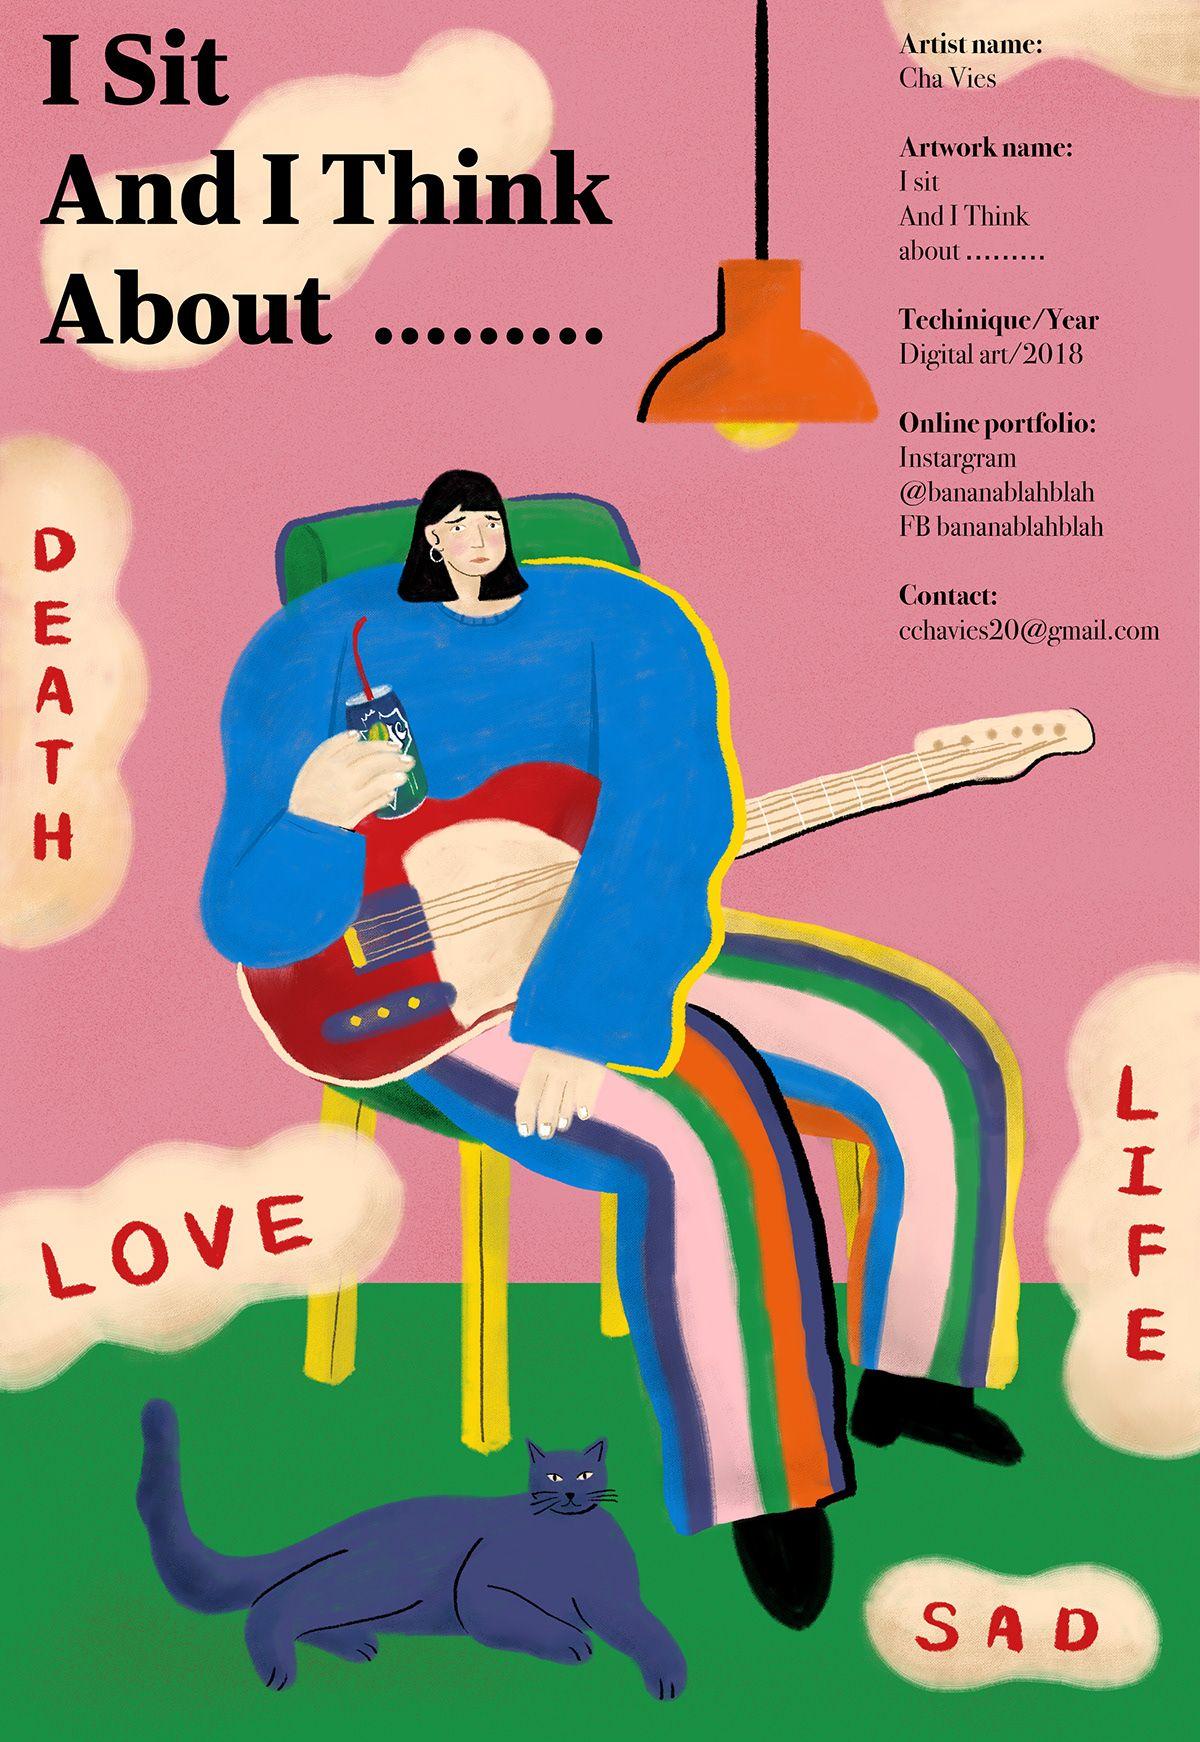 A Day The Jam Mag On Behance Graphic Design Art Artist Names Online Portfolio